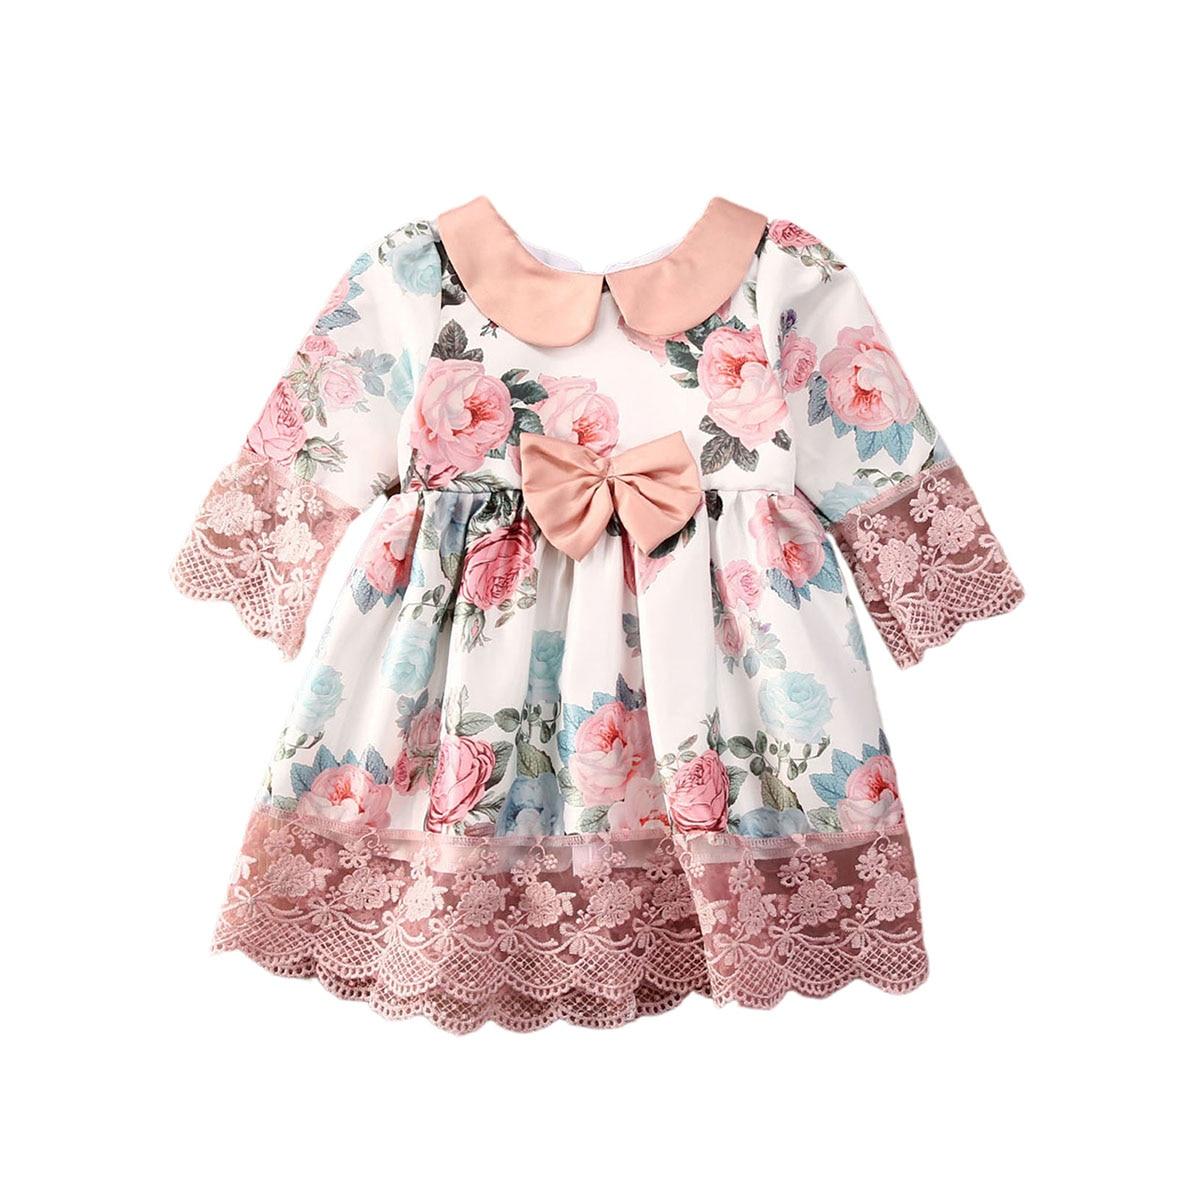 Toddler Kids Baby Girl Summer Princess Dress Tassels Party Communion Dress 0-5Y